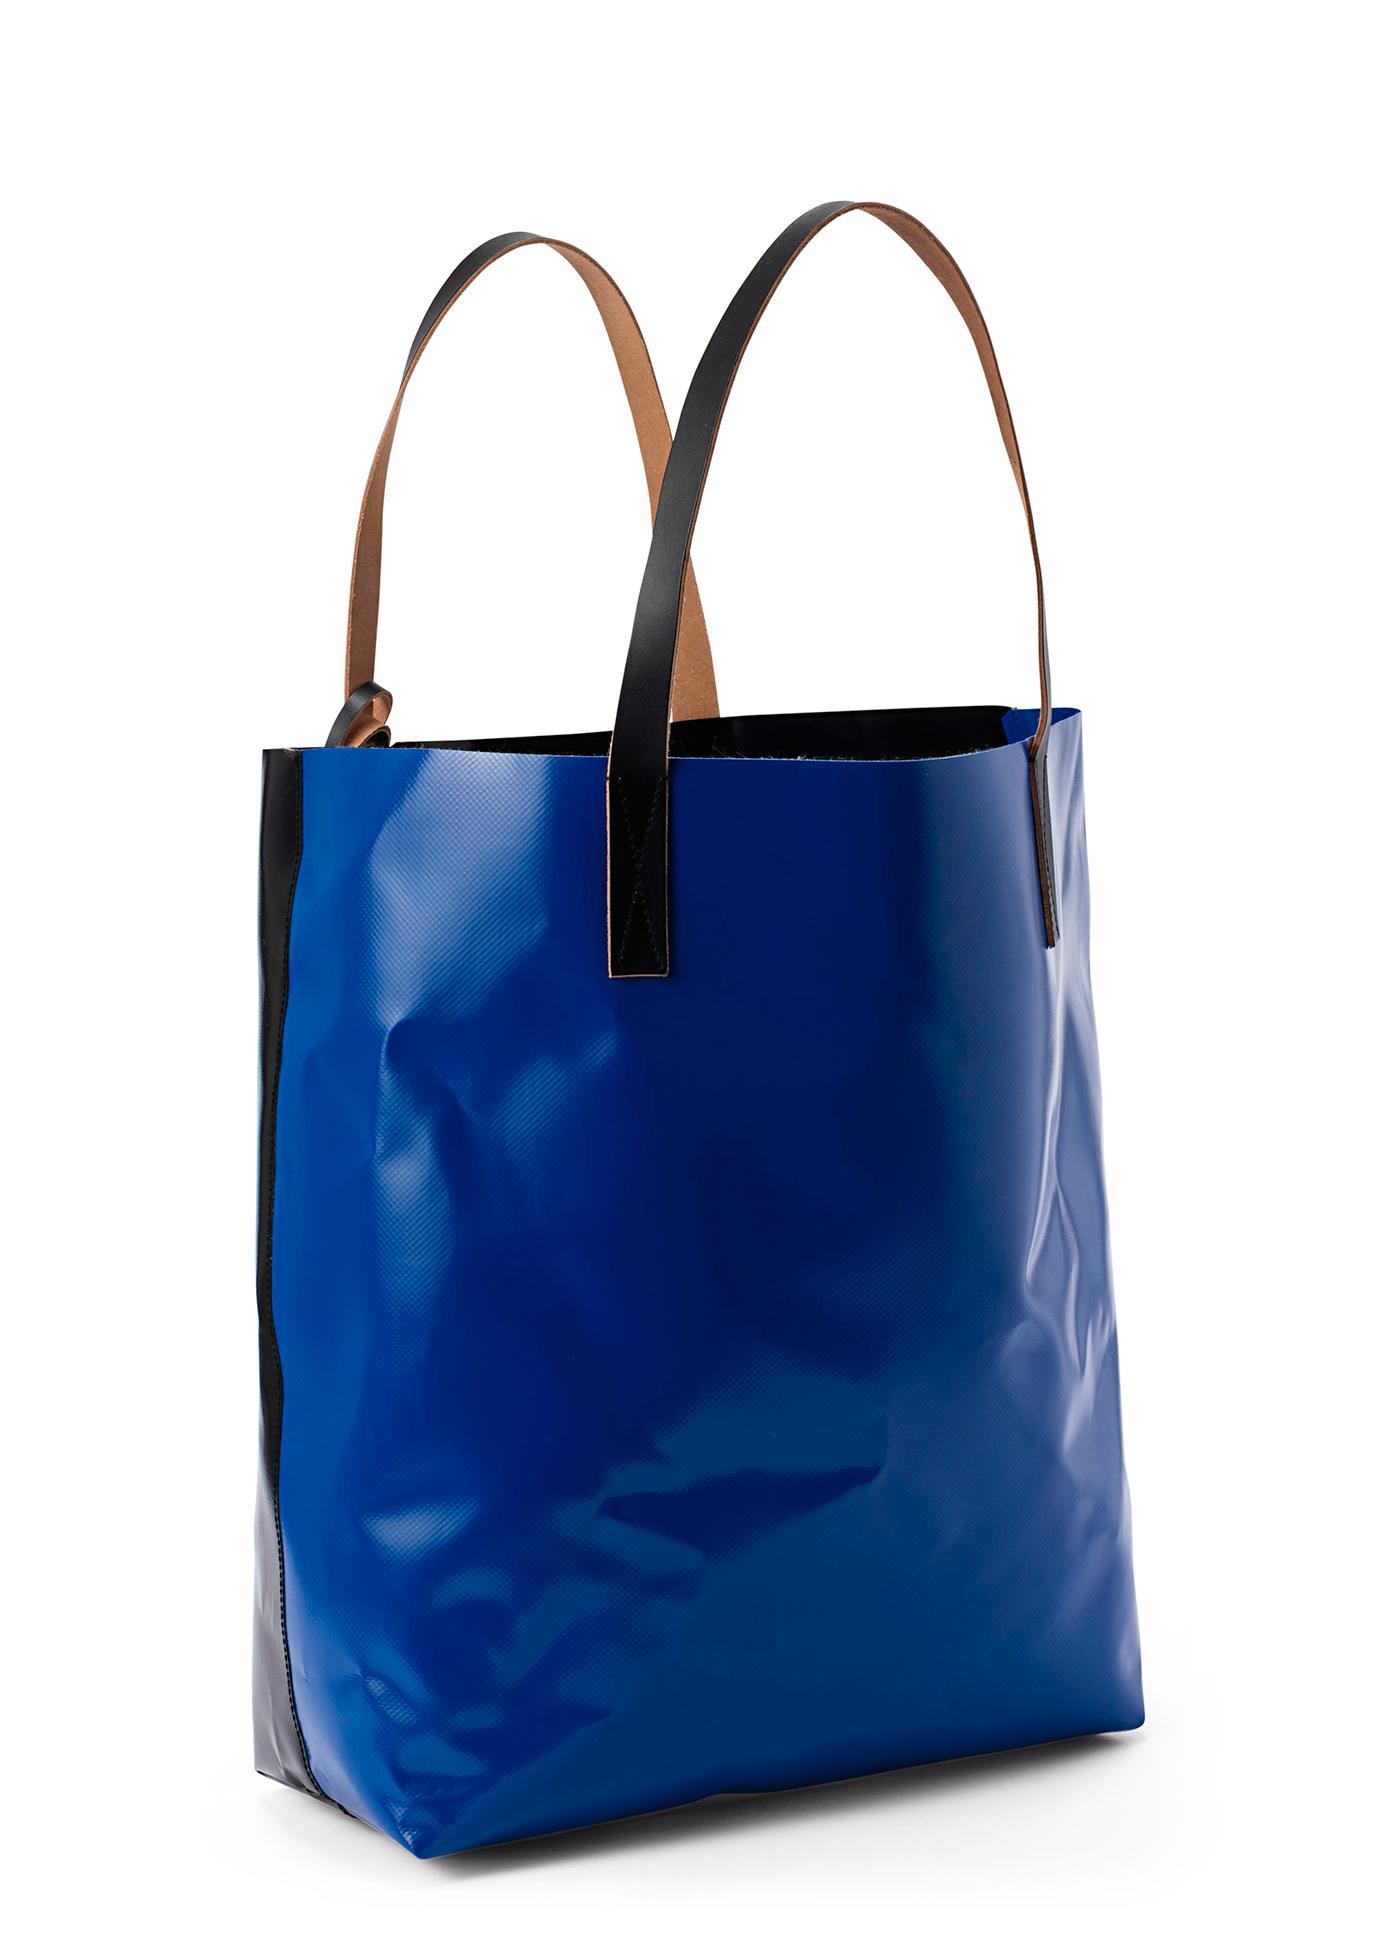 SHOPPING BAG image number 1